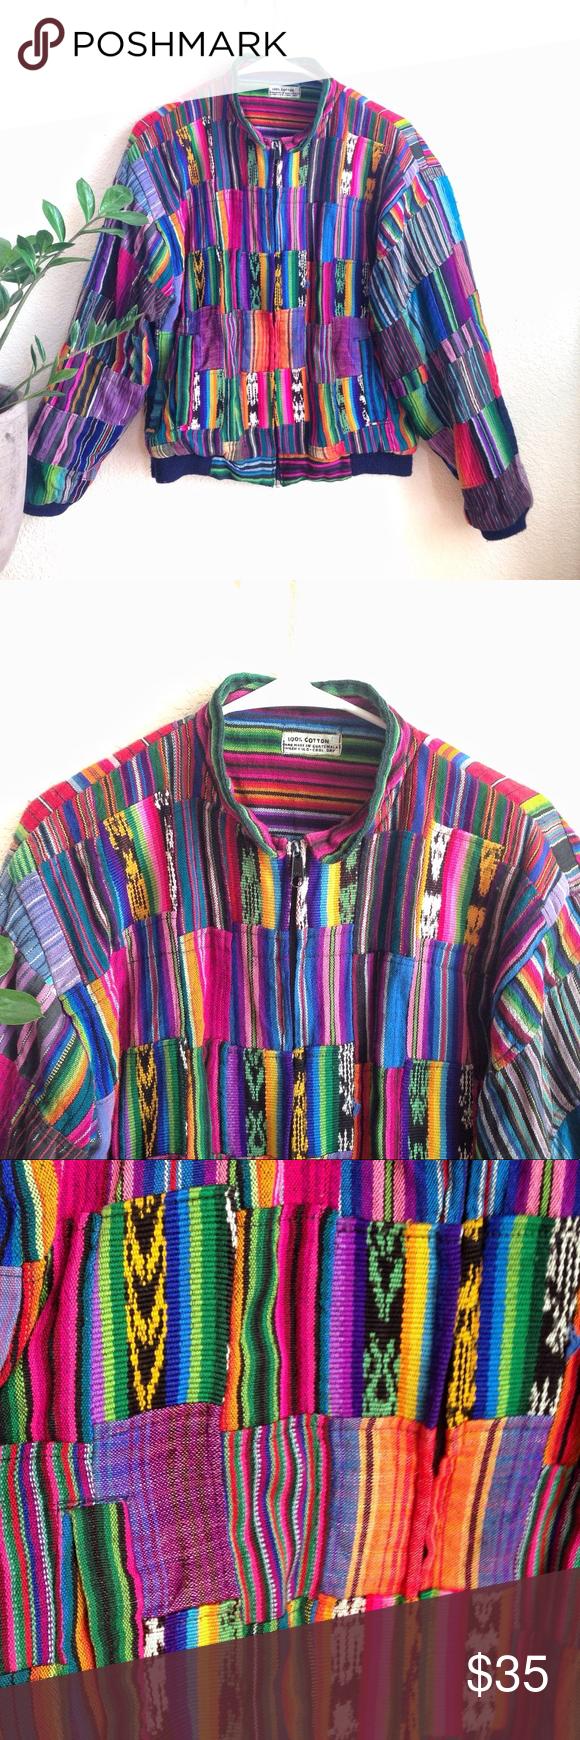 Vintage 90s Retro Guatemala Hippie Style Jacket